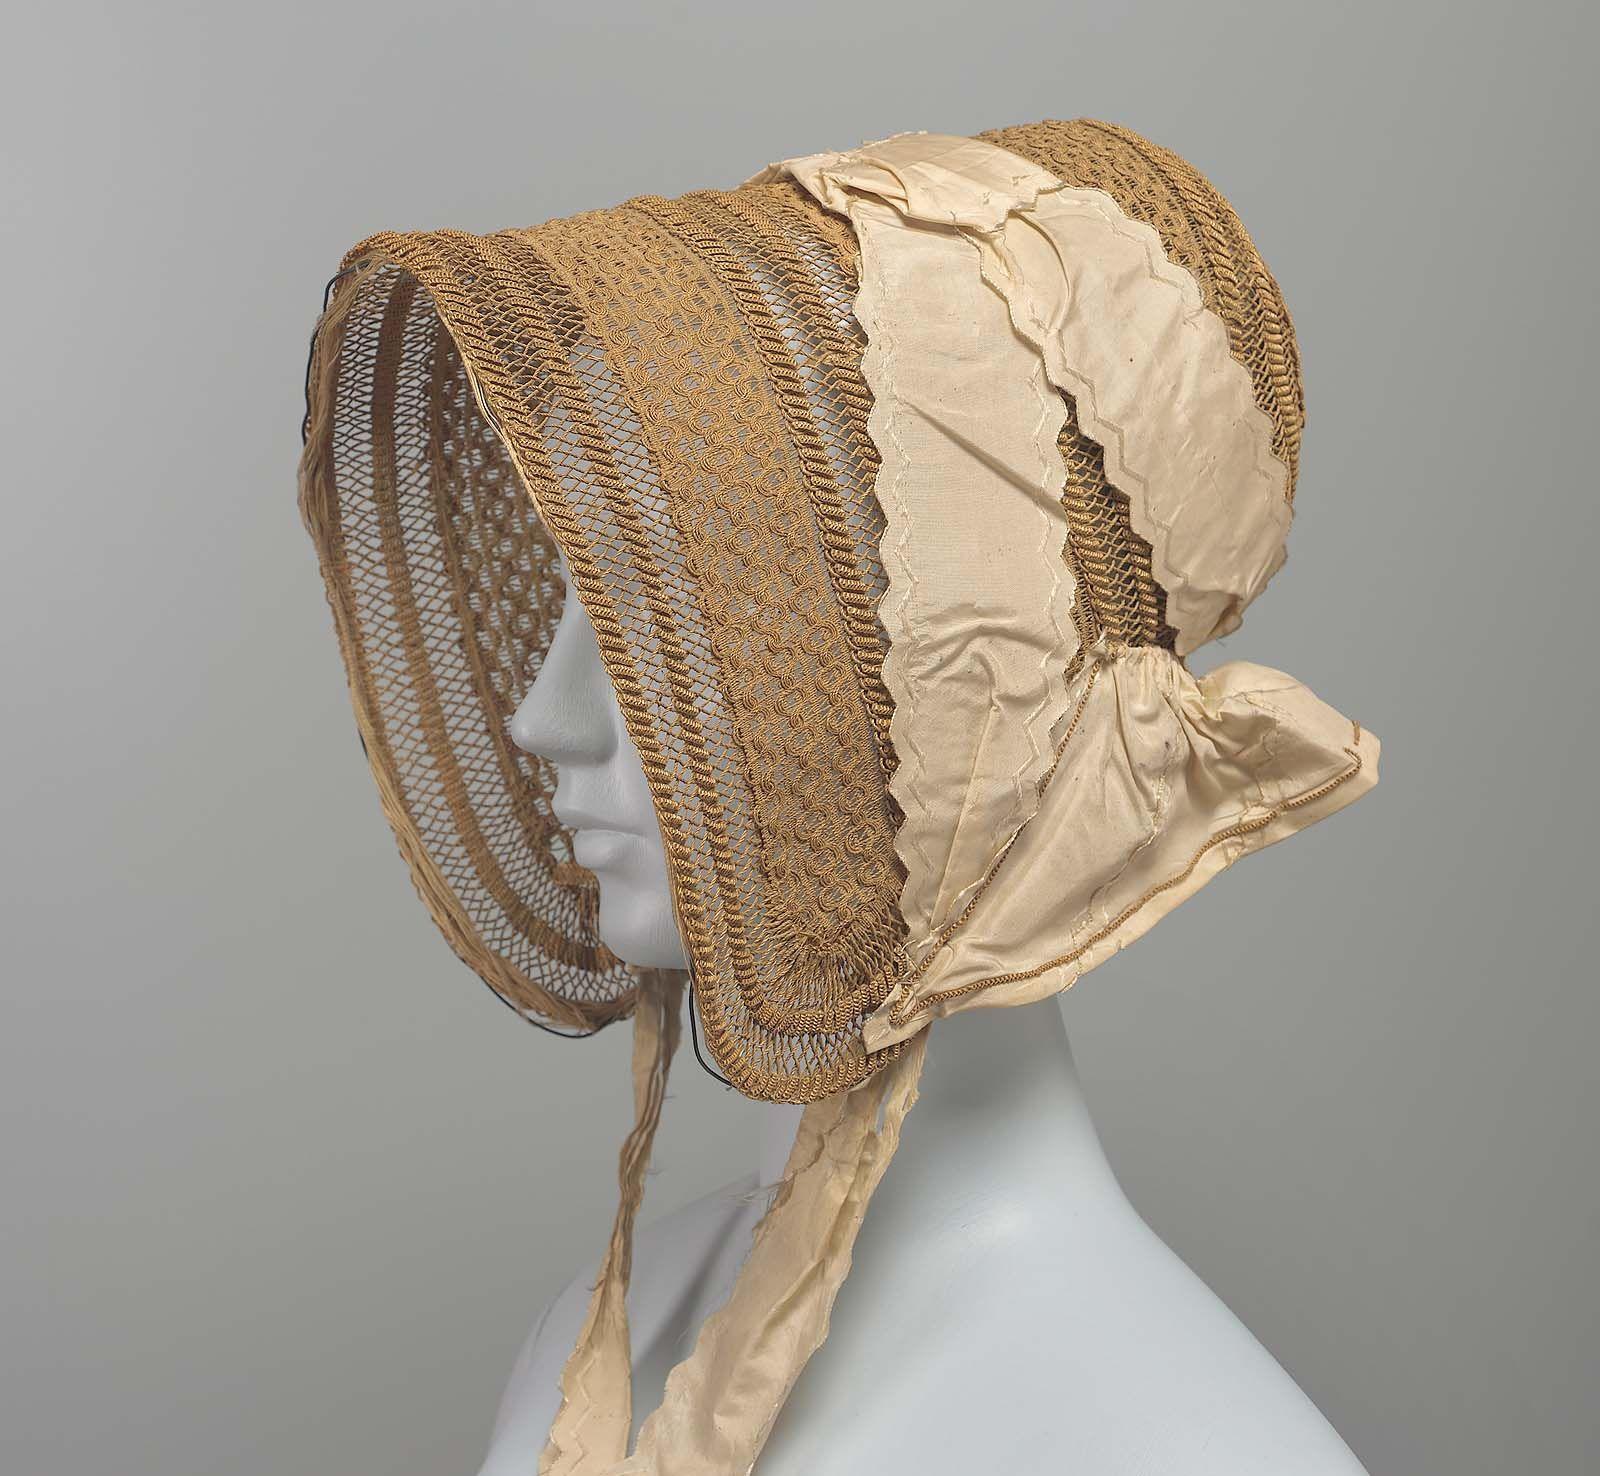 Straw bonnet, American (?), Ca 1840s. Museum of Fine Arts, nr. 44.207